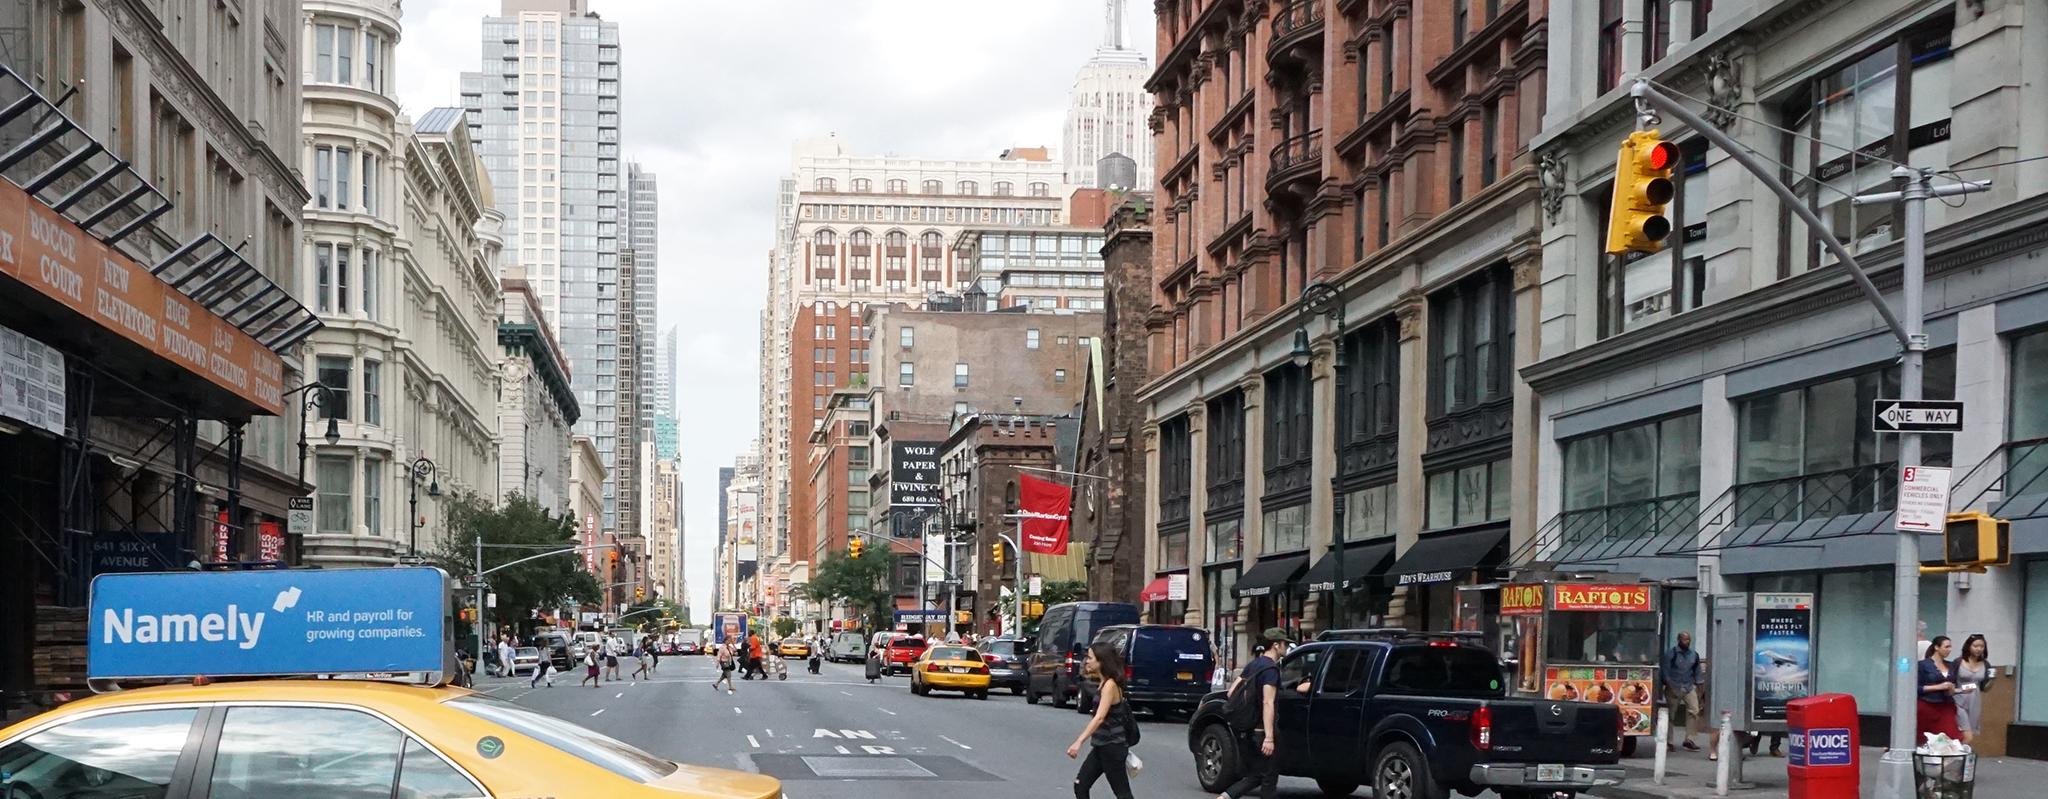 new york cithy 6th street